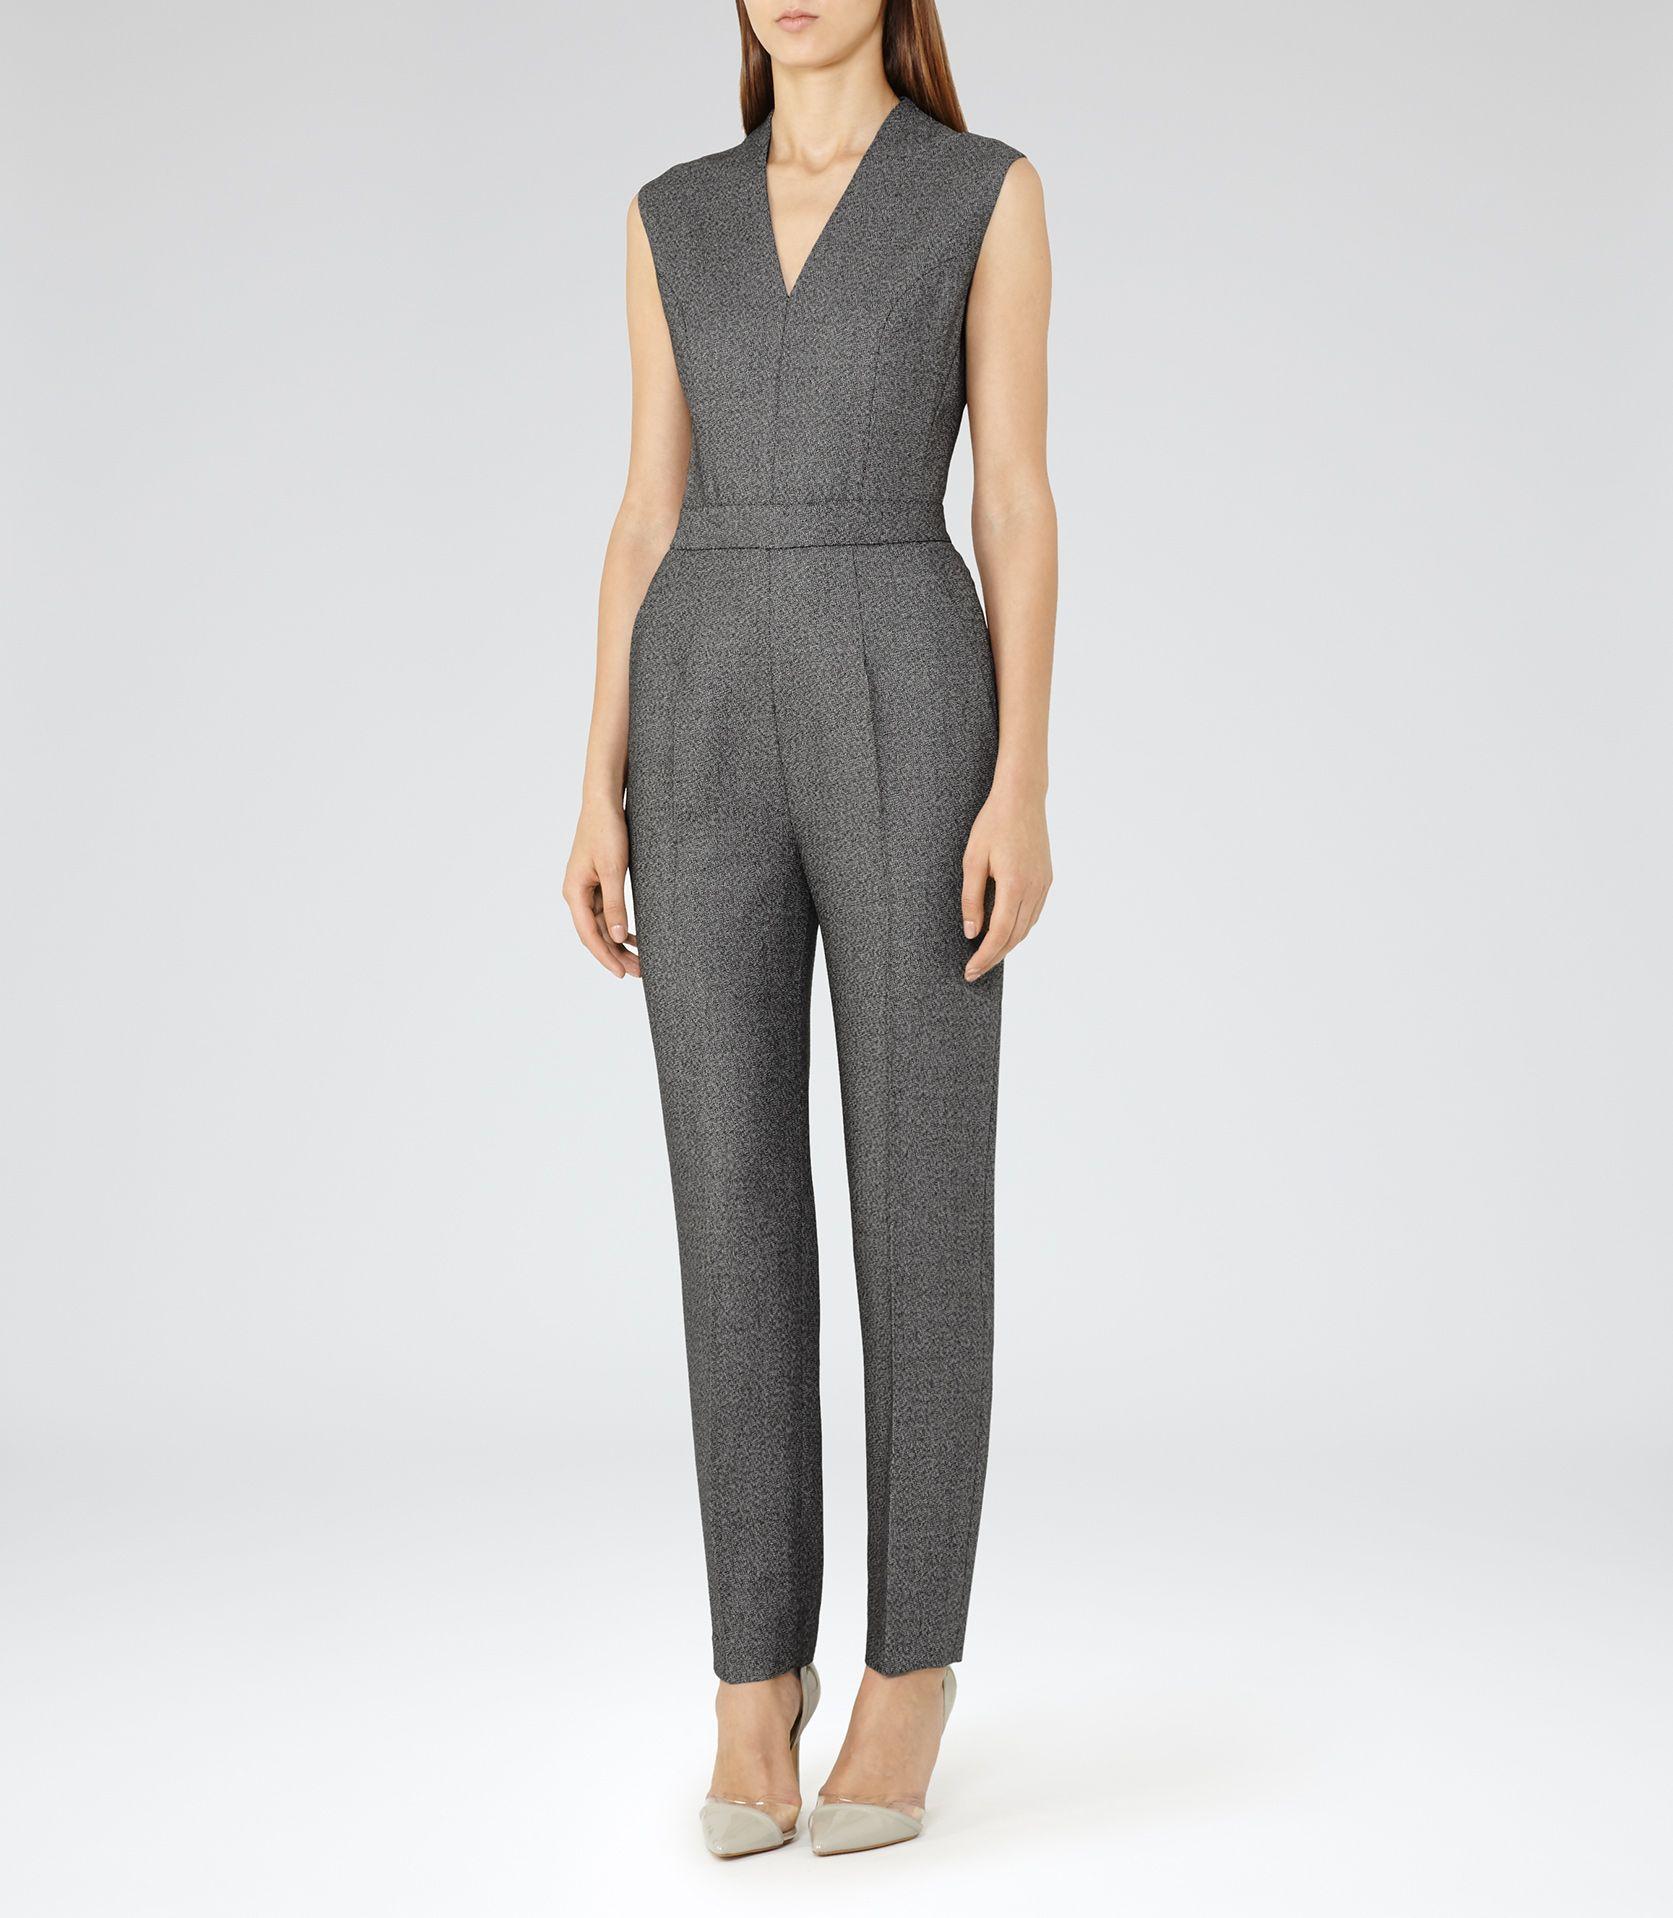 dc77b32e97f Womens Grey black Tailored Jumpsuit - Reiss Gabrielle Jumpsuit ...